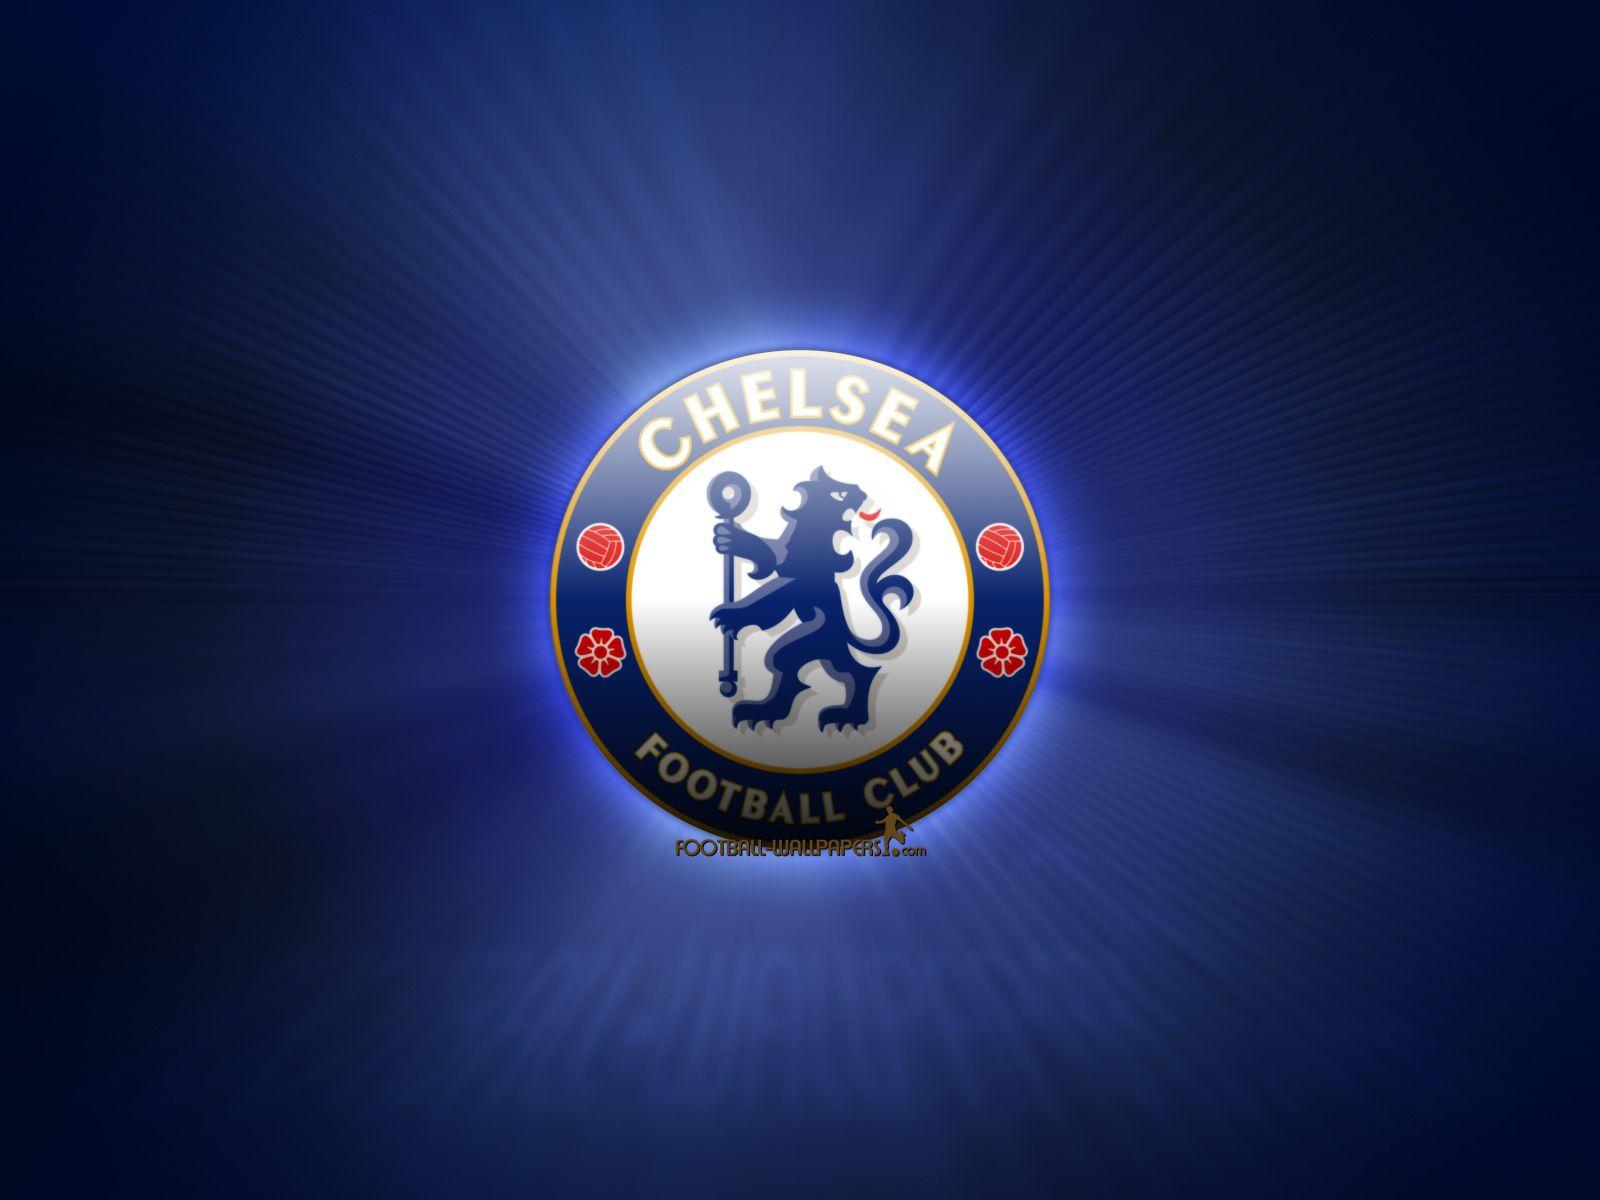 Chelsea Fc Desktop Wallpaper: Chelsea Fc Wallpaper And Background Image